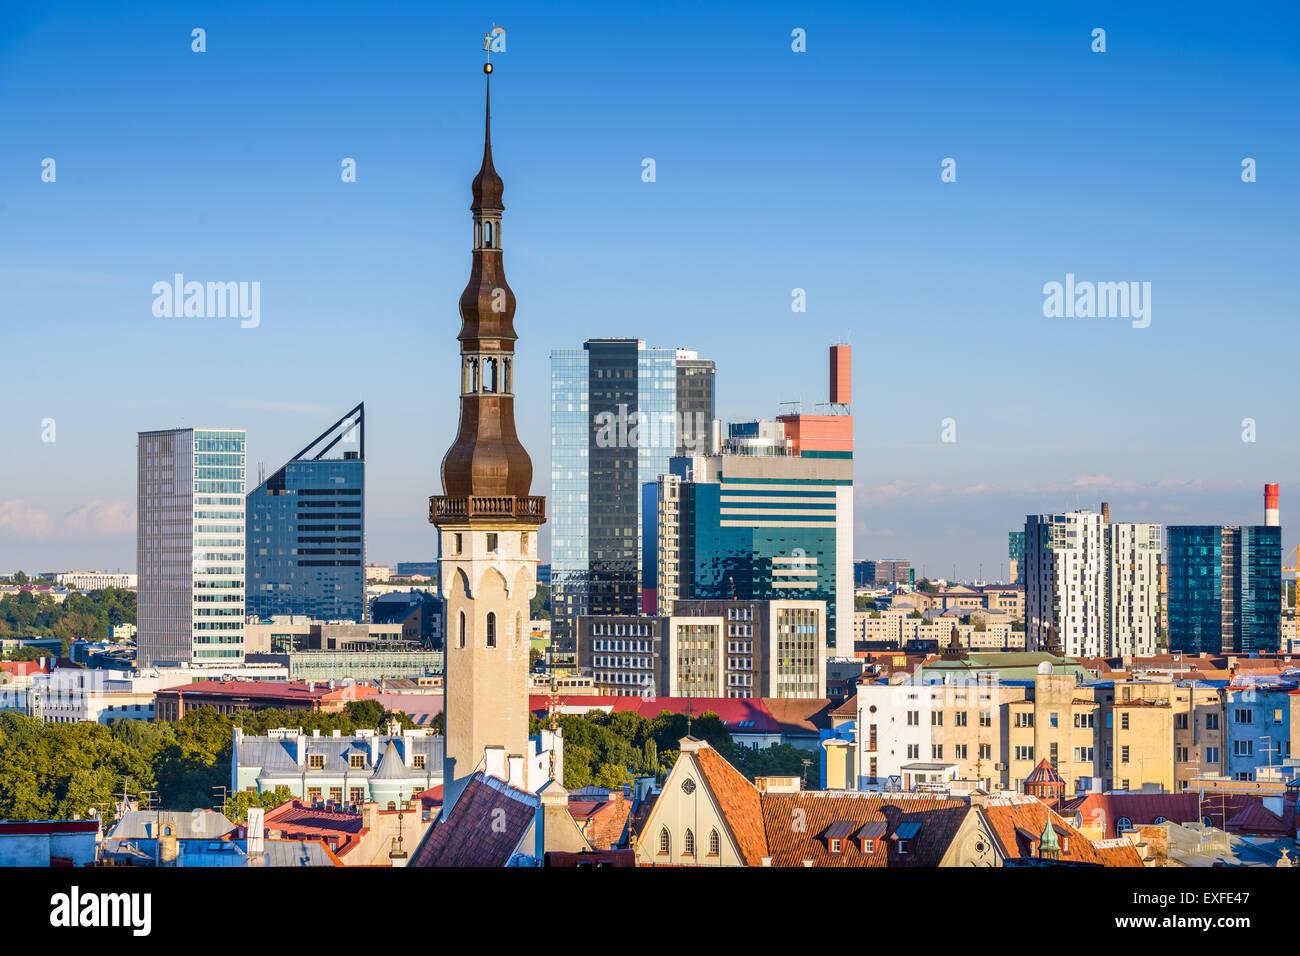 Tallinn, Estonia skyline with modern and historic buildings. - Stock Image